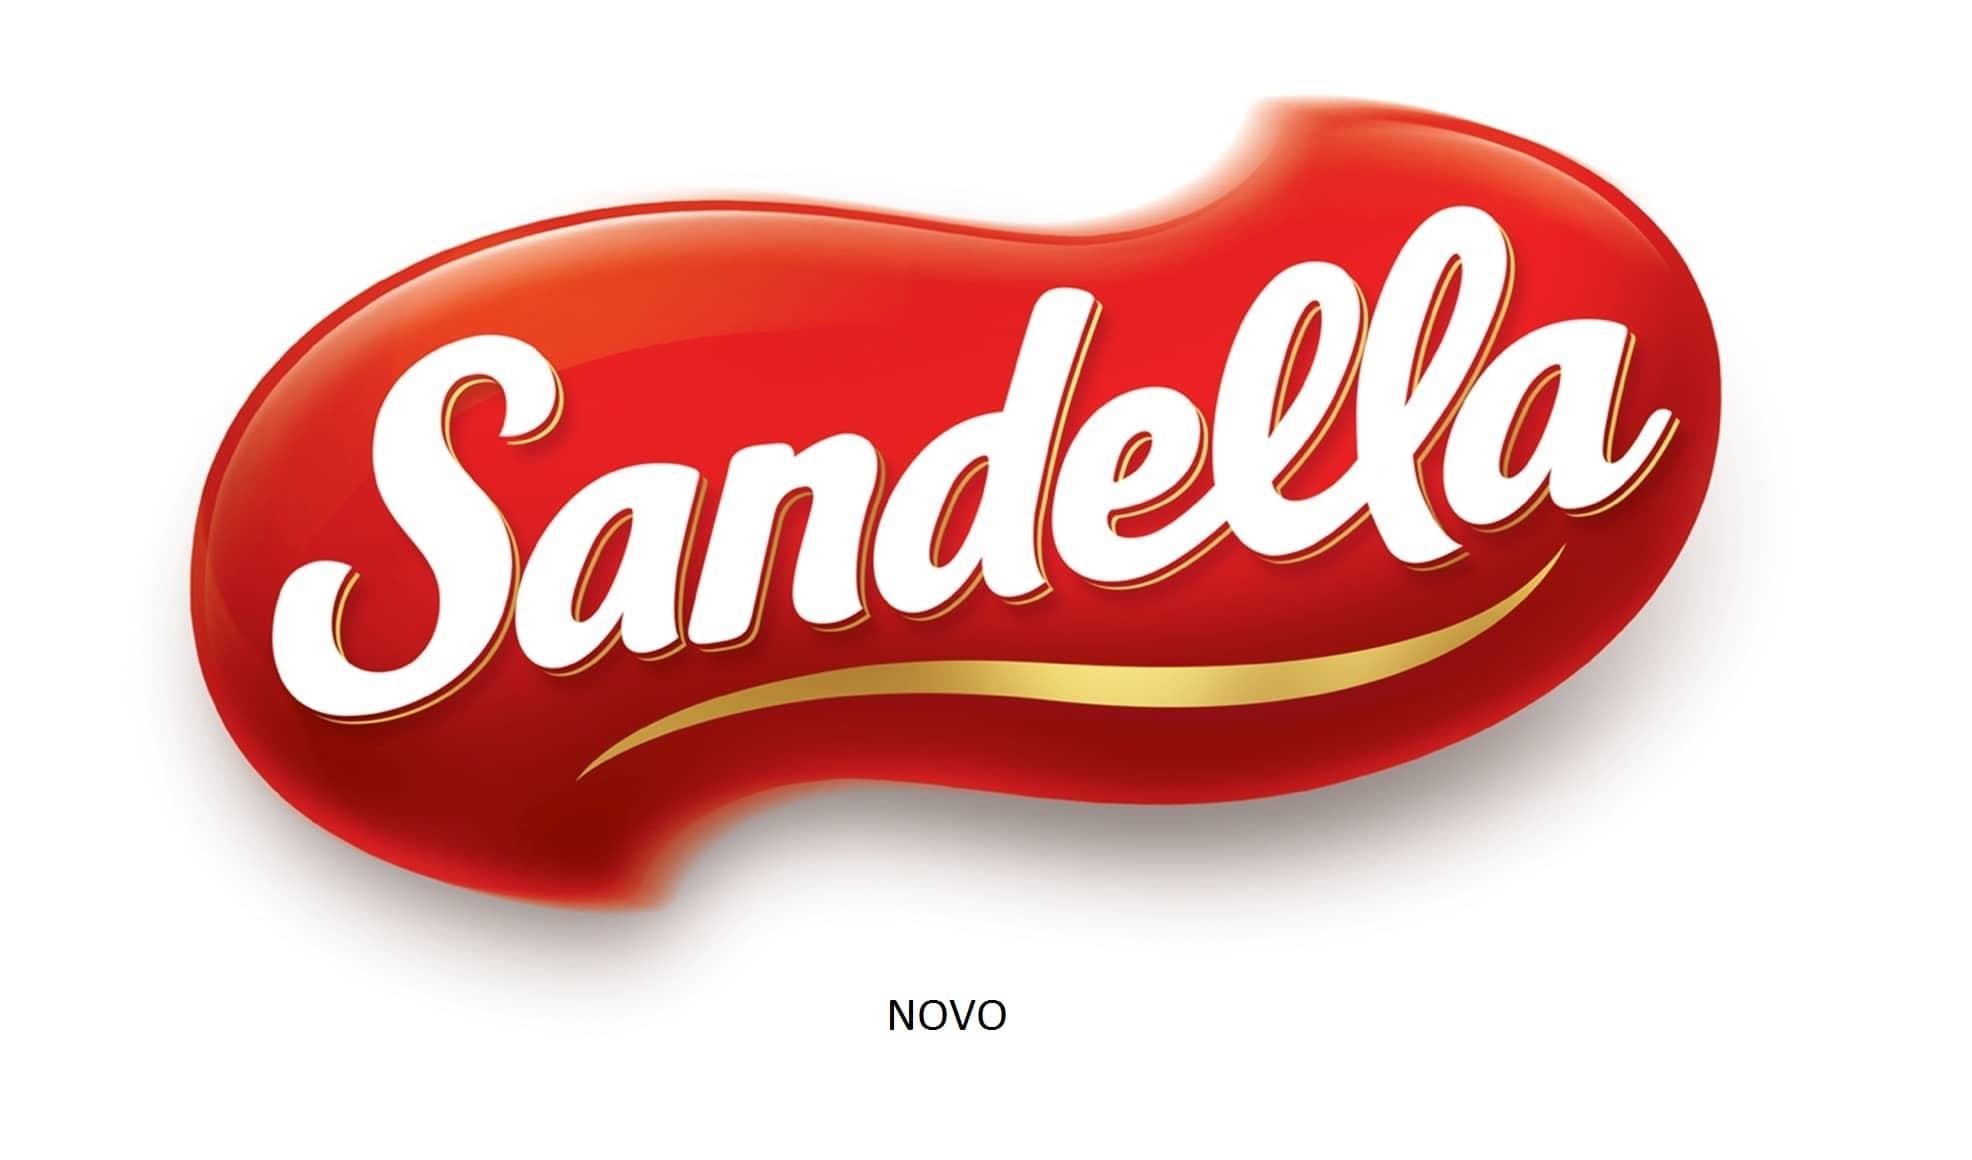 Nova-logo-Sandella